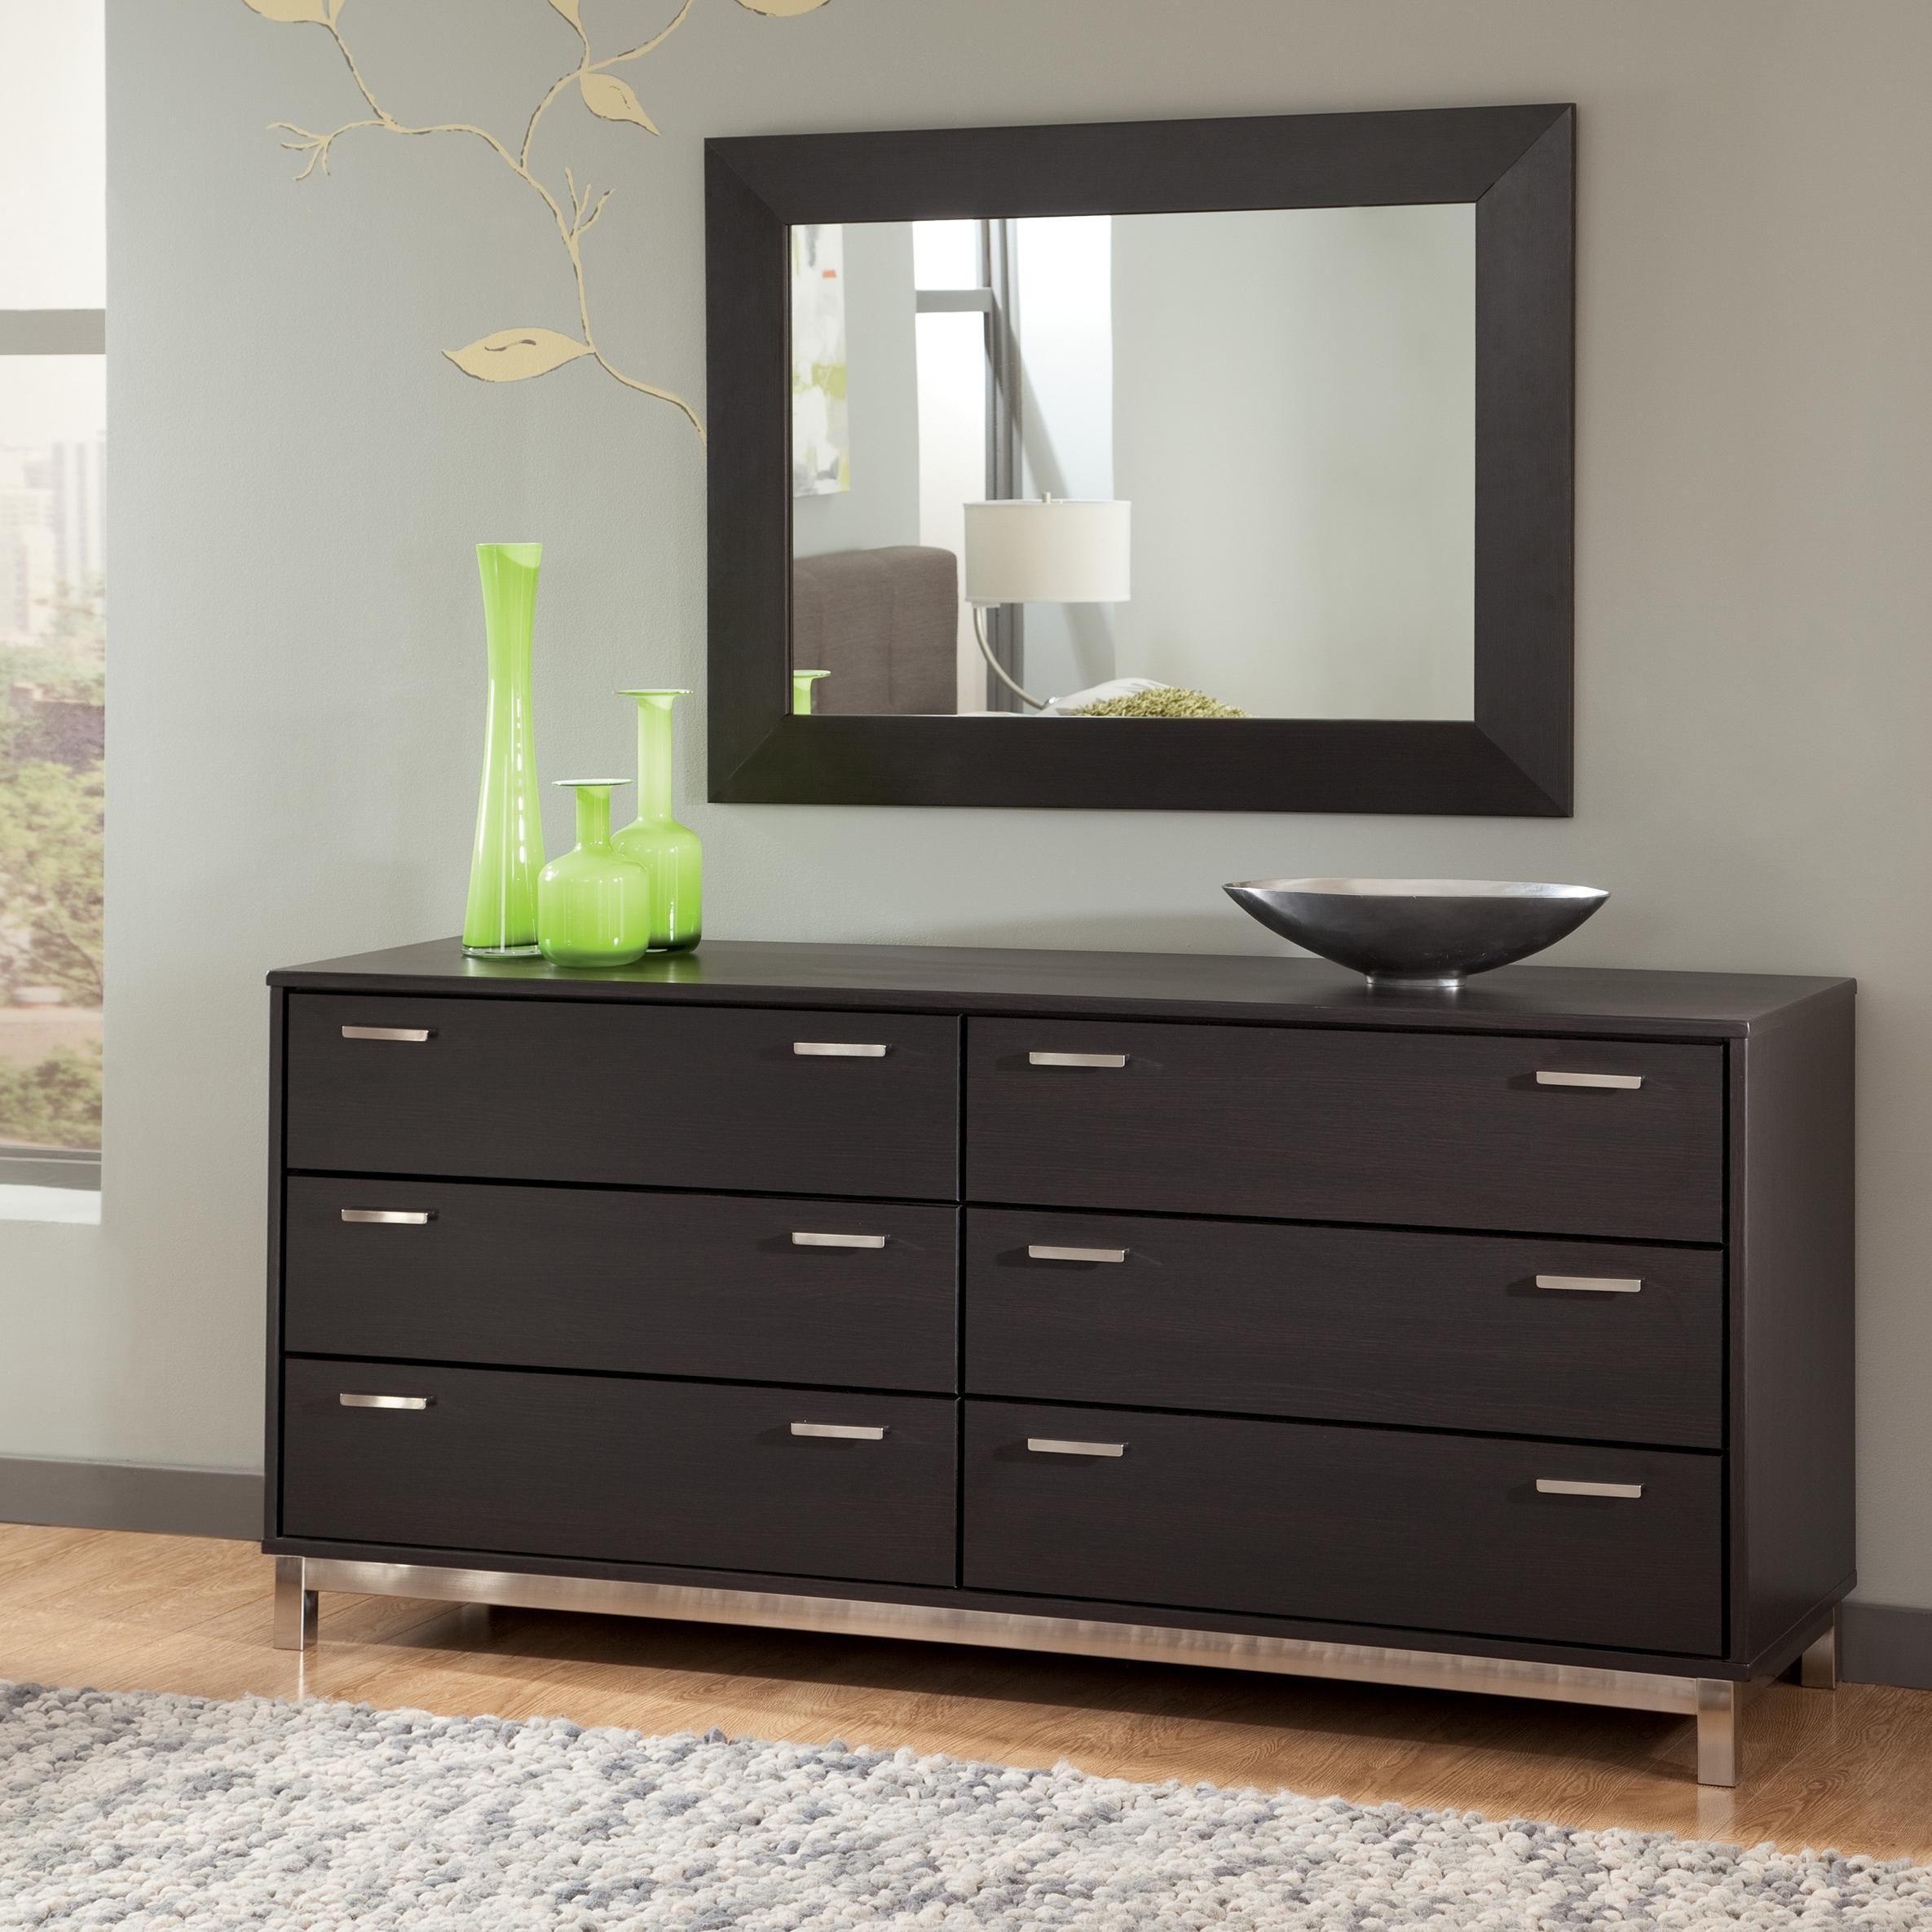 Master Bedroom Dresser Modern Bedroom Dressers Bedroom Dressers